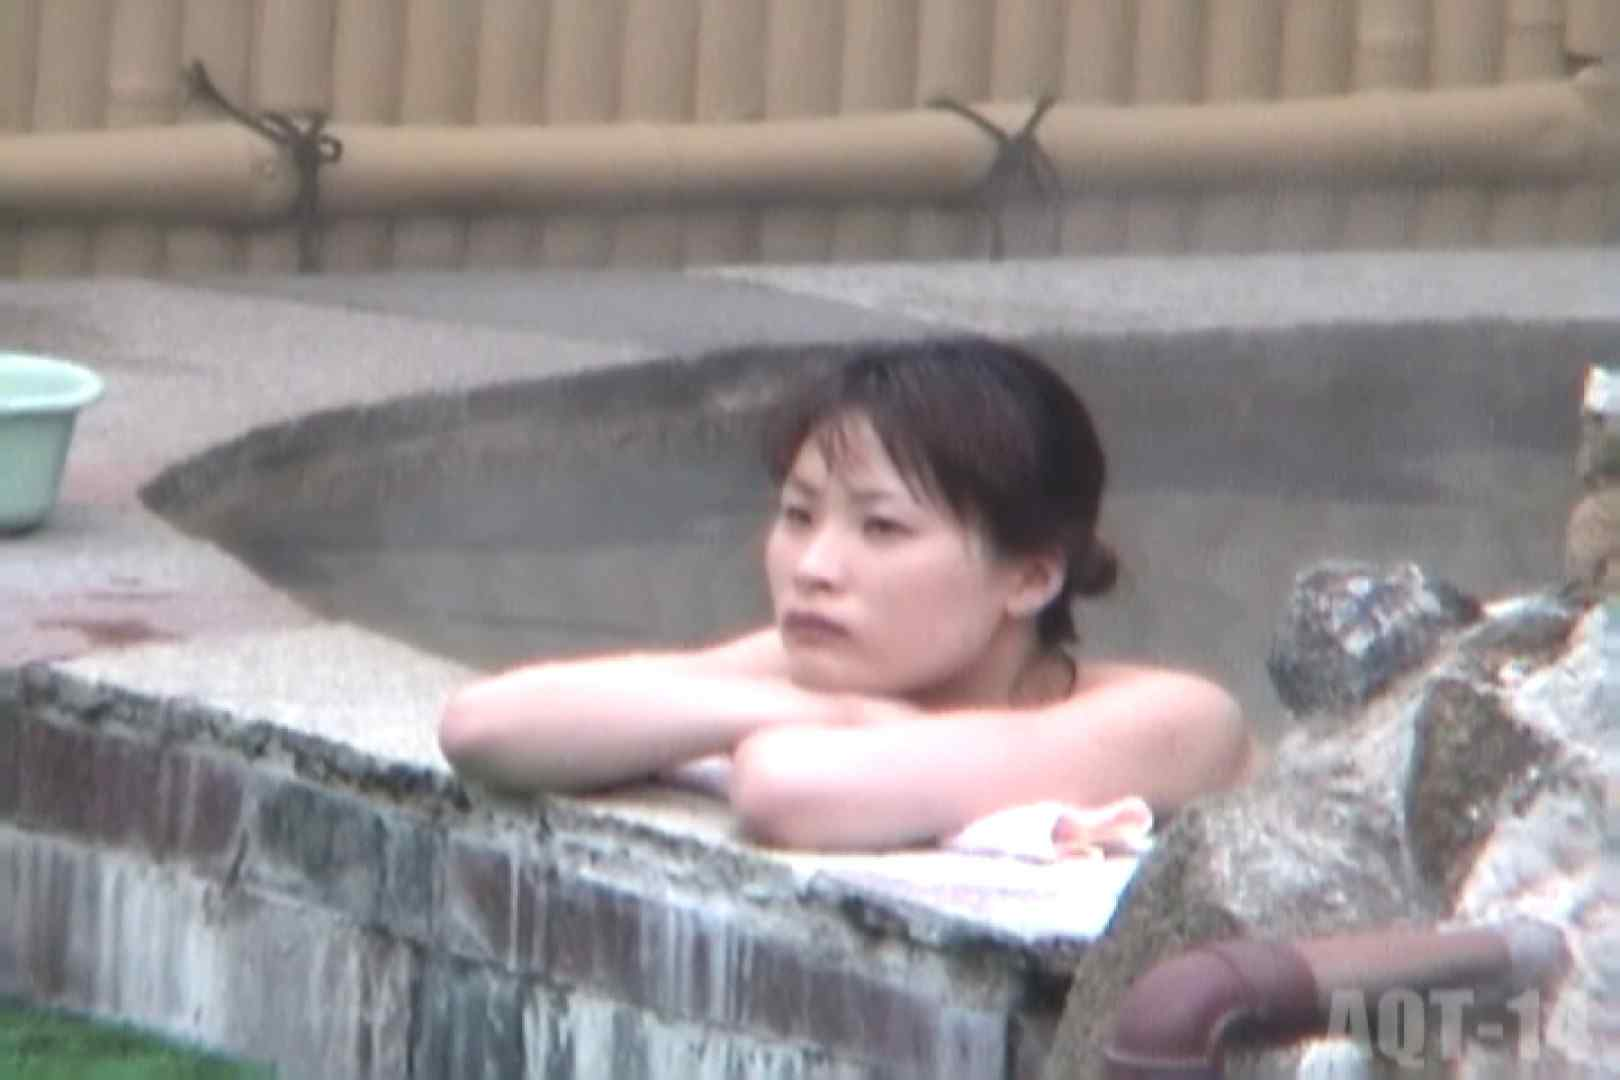 Aquaな露天風呂Vol.822 盗撮シリーズ | 露天風呂編  78PIX 5